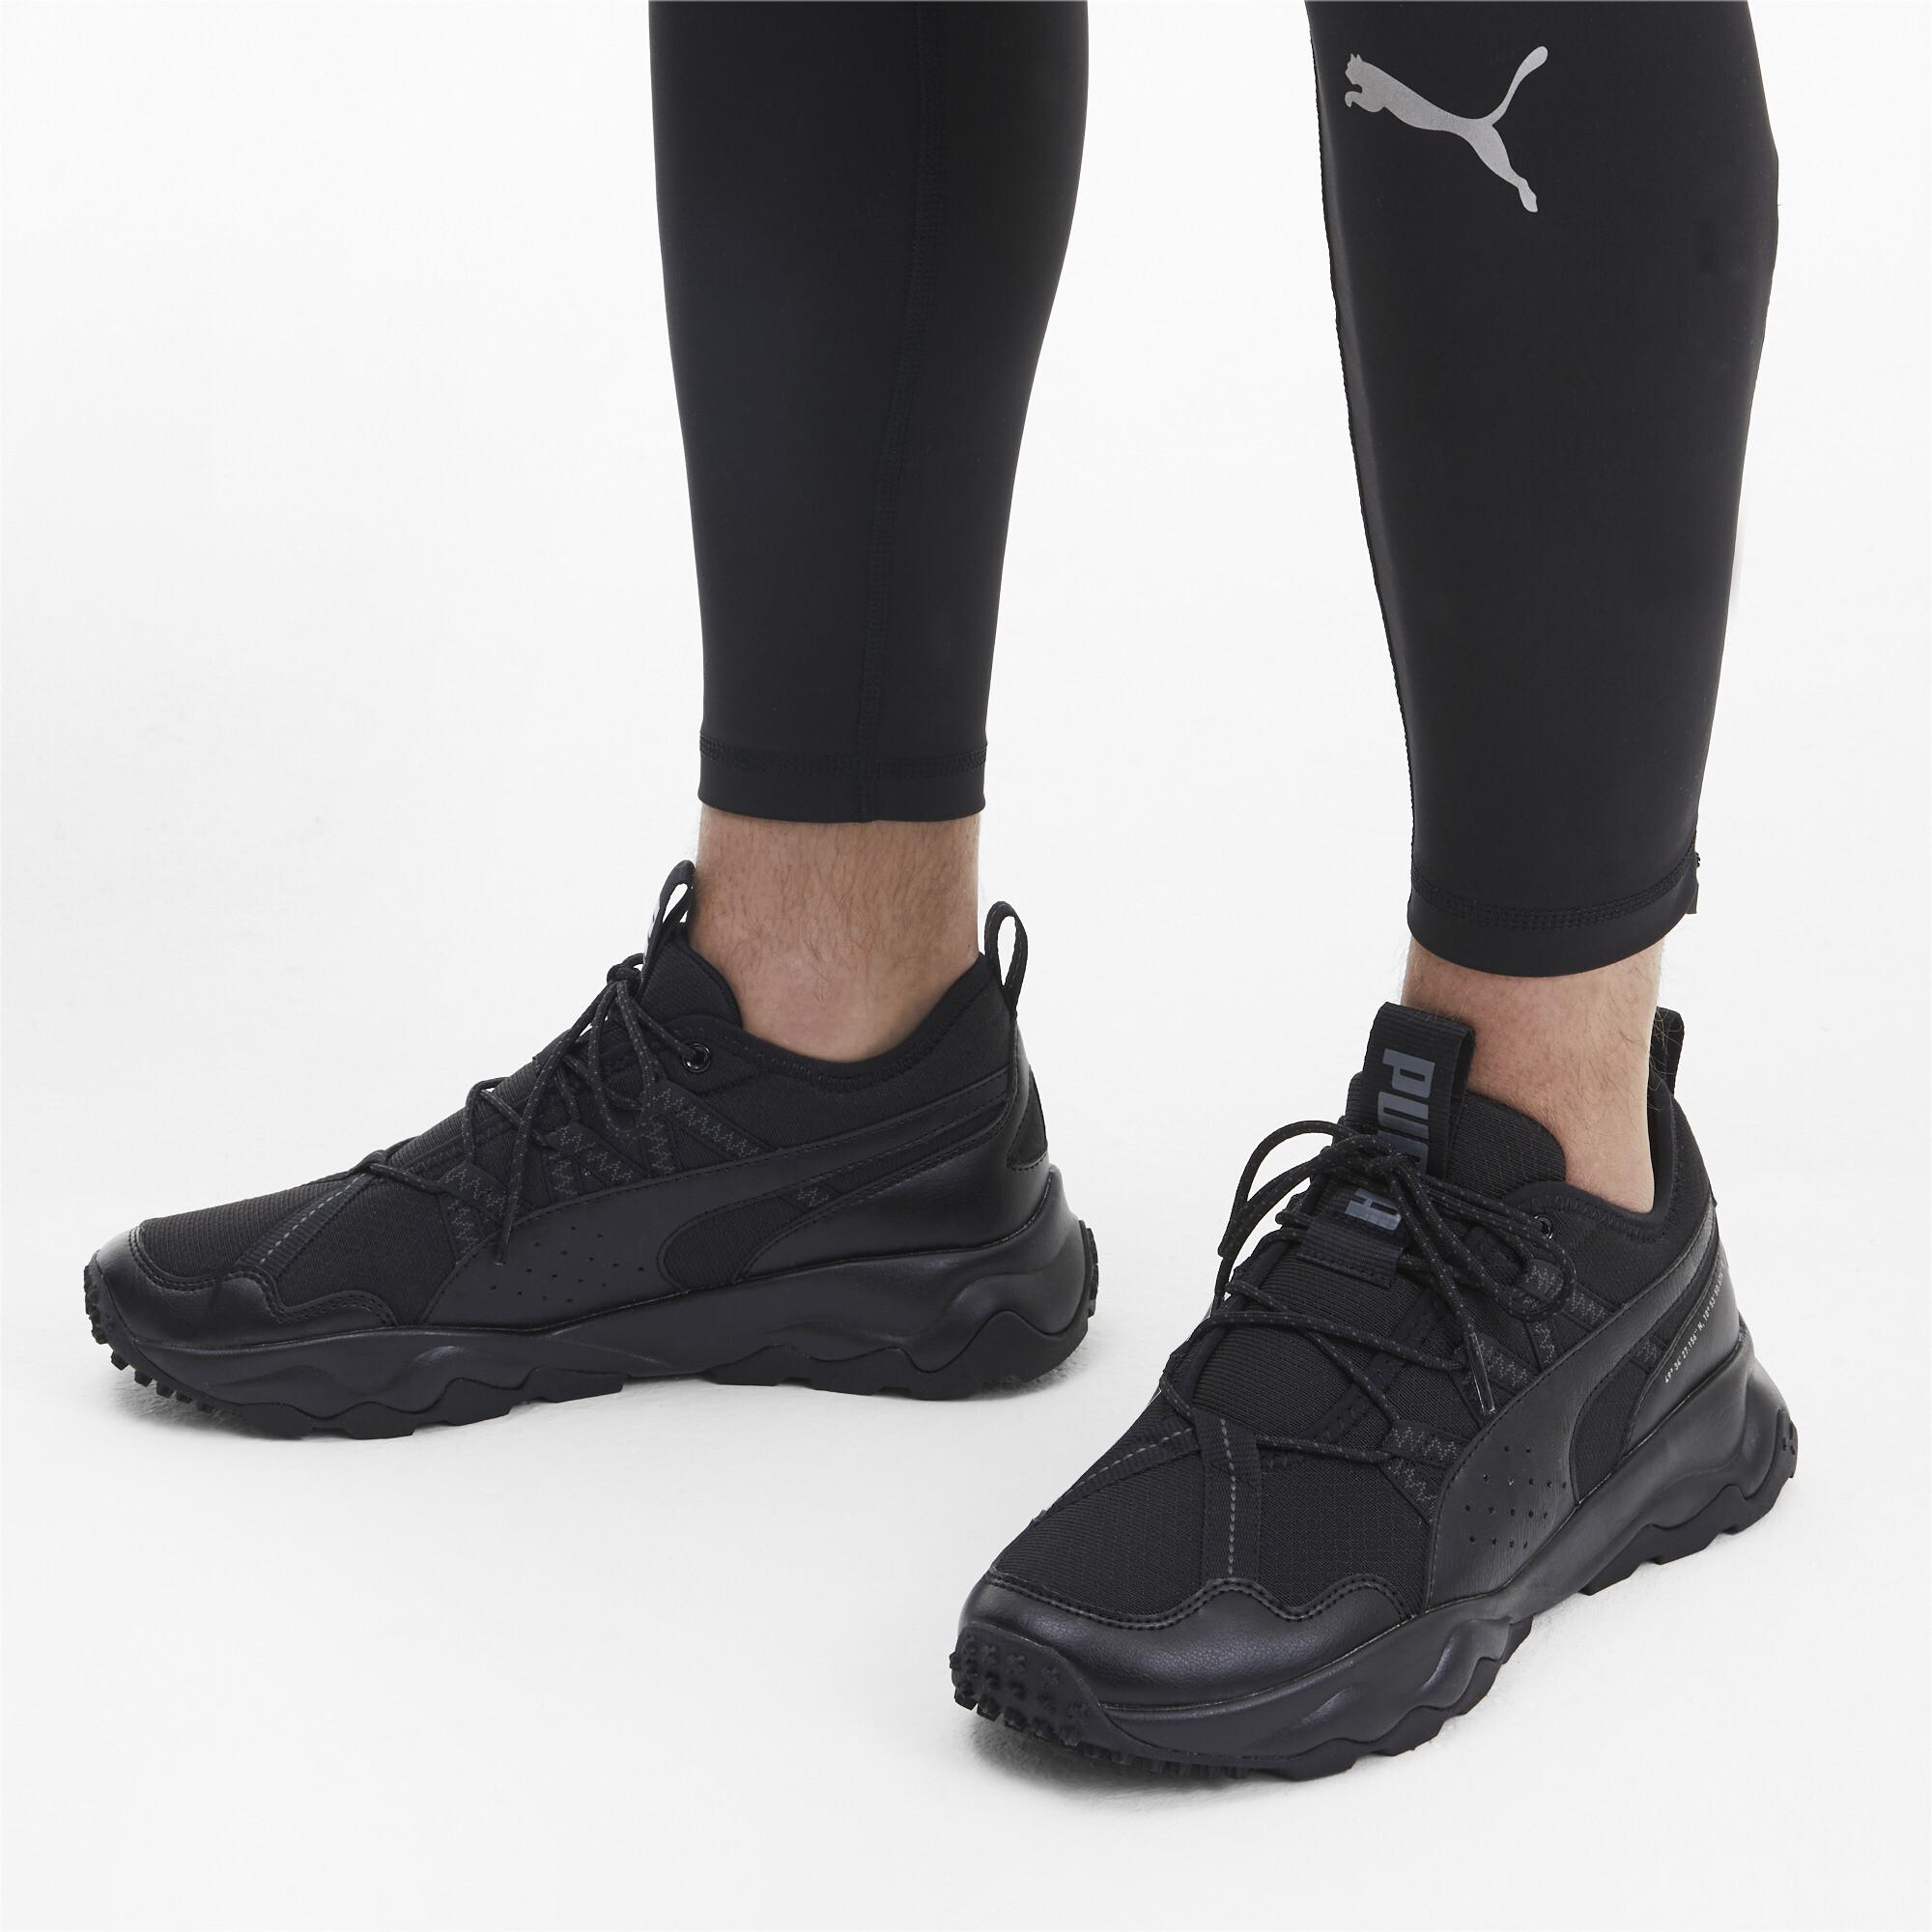 PUMA-Ember-Trail-Men-s-Running-Shoes-Men-Shoe-Running thumbnail 9